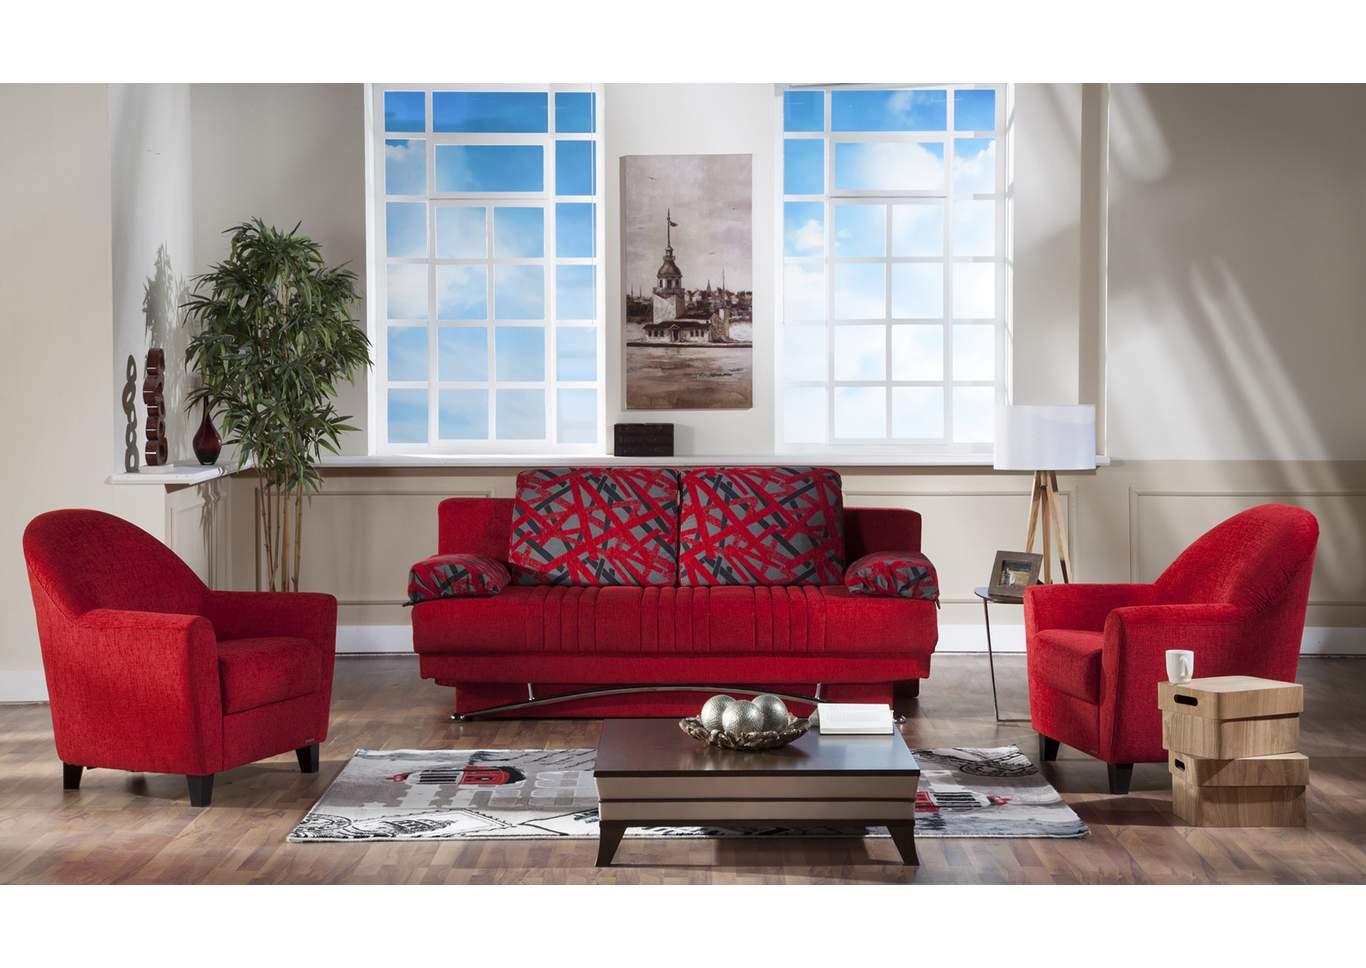 Phenomenal Lofa Sofa Bedz Fantasy Red Queen Sleeper Spiritservingveterans Wood Chair Design Ideas Spiritservingveteransorg